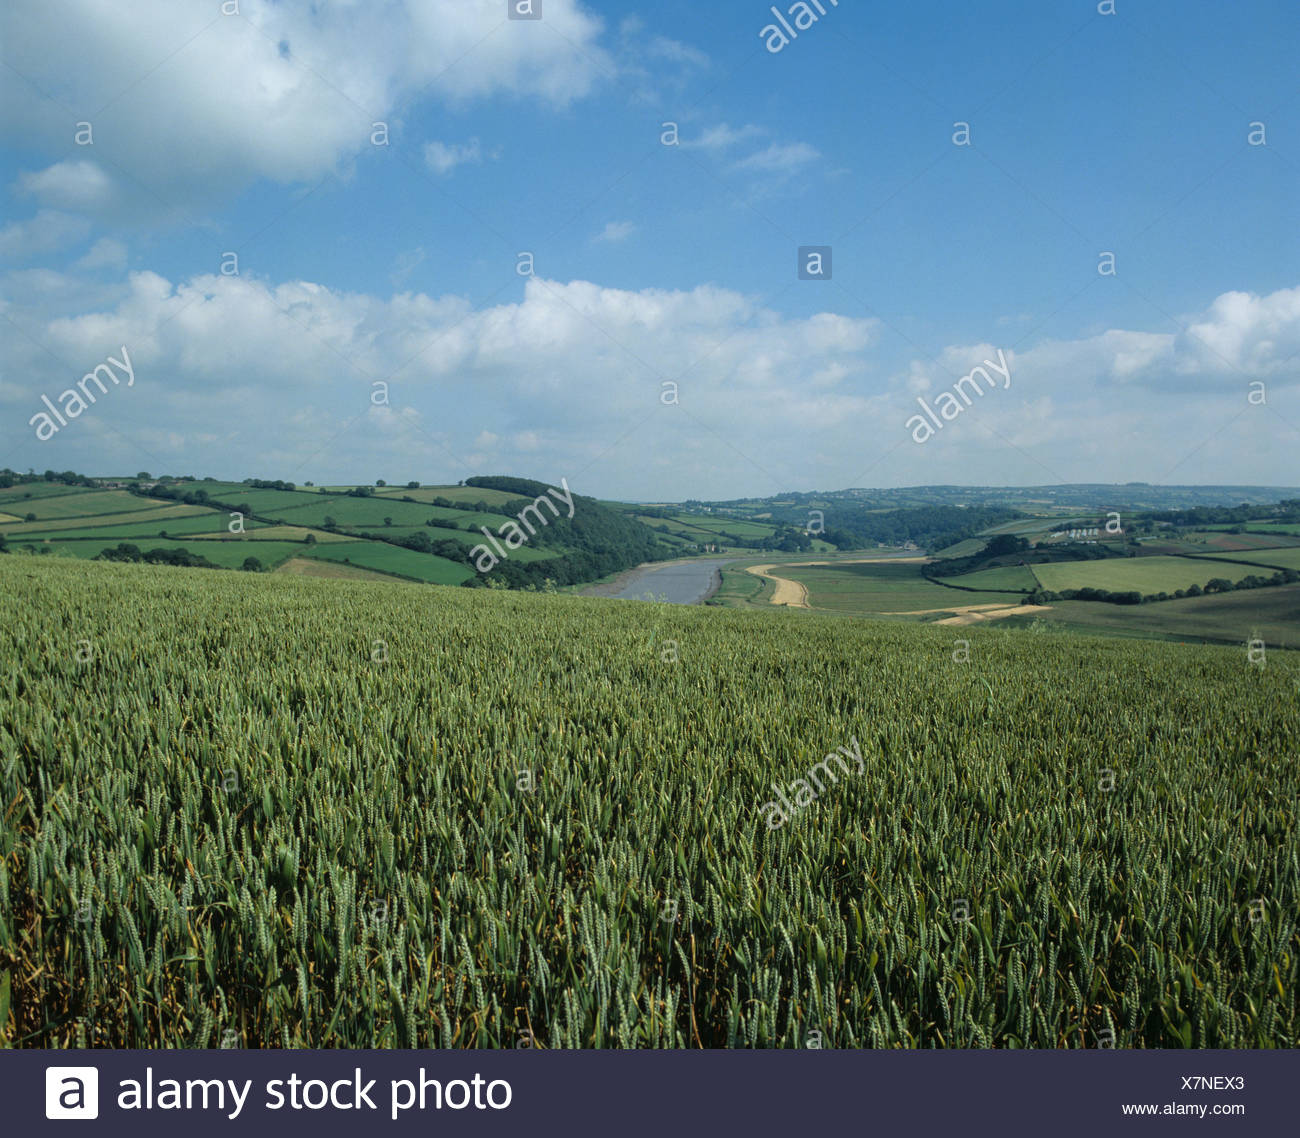 Wheat crop in green unripe ear on the Devon Cornwall border overlooking the Tamar River Stock Photo